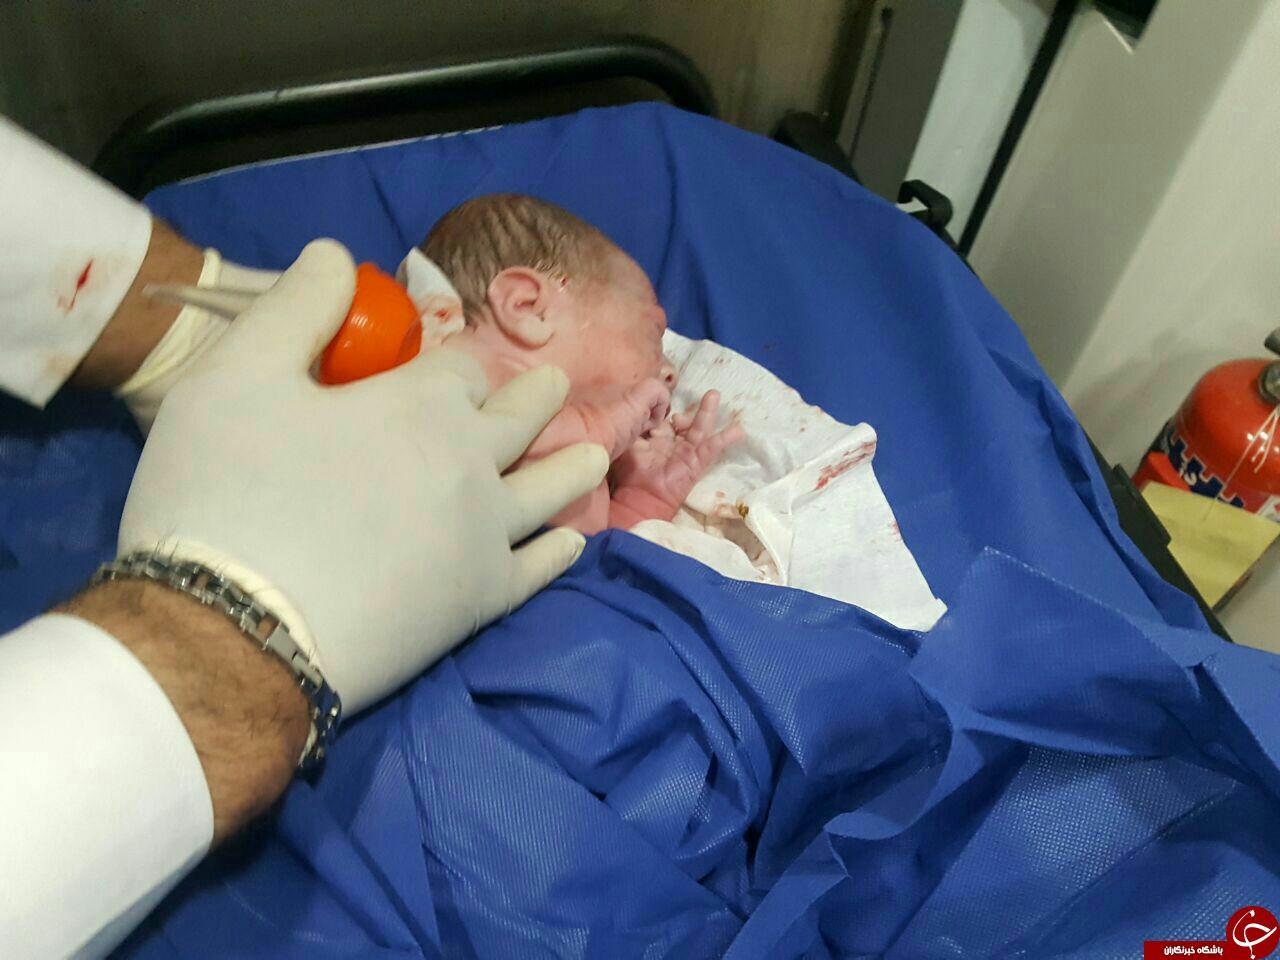 نوزاد عنبرآبادی درآمبولانس متولد شد